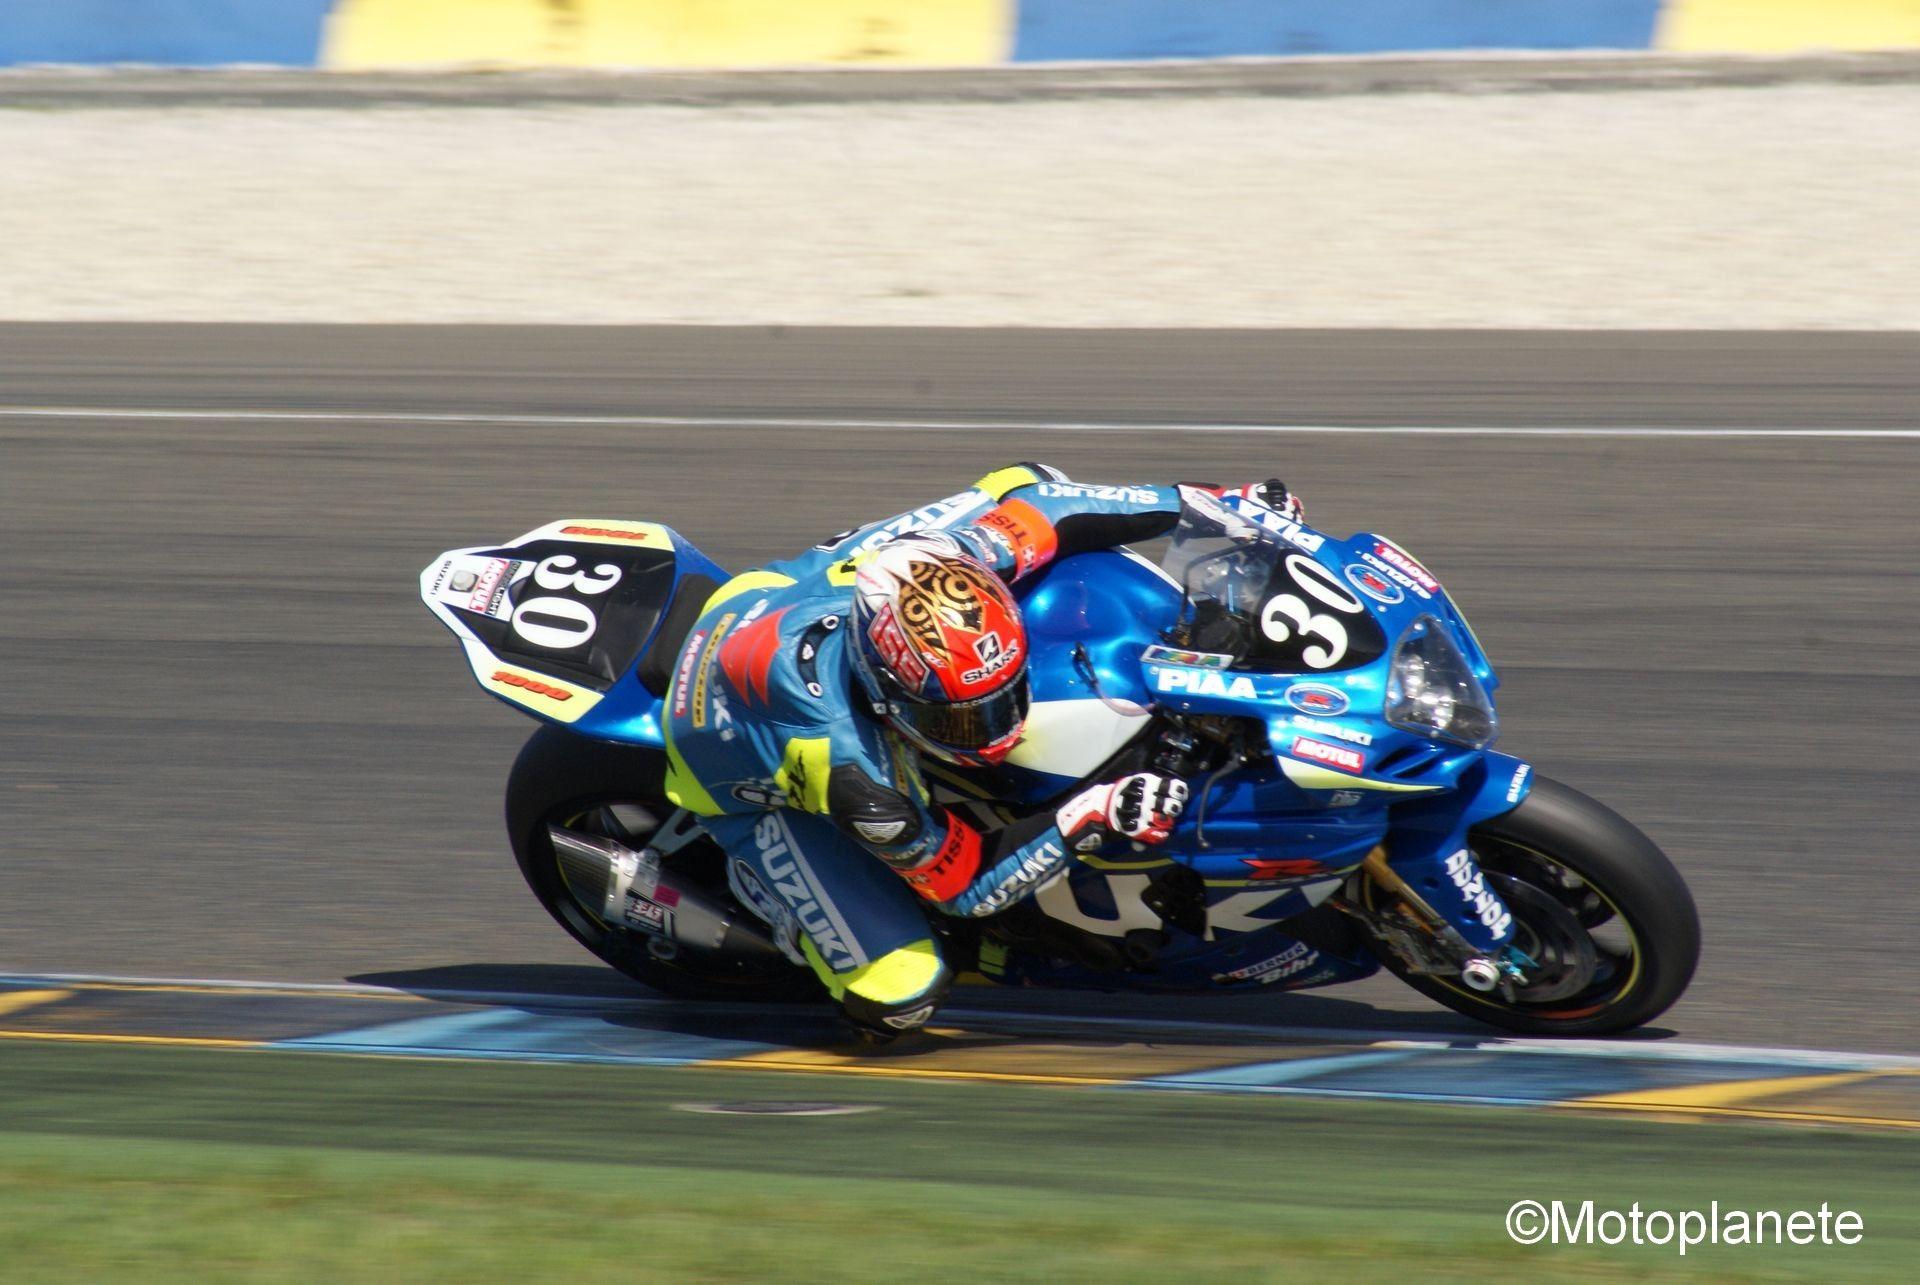 24 Heures motos 2015 Motos, L'heure, Circuit du mans